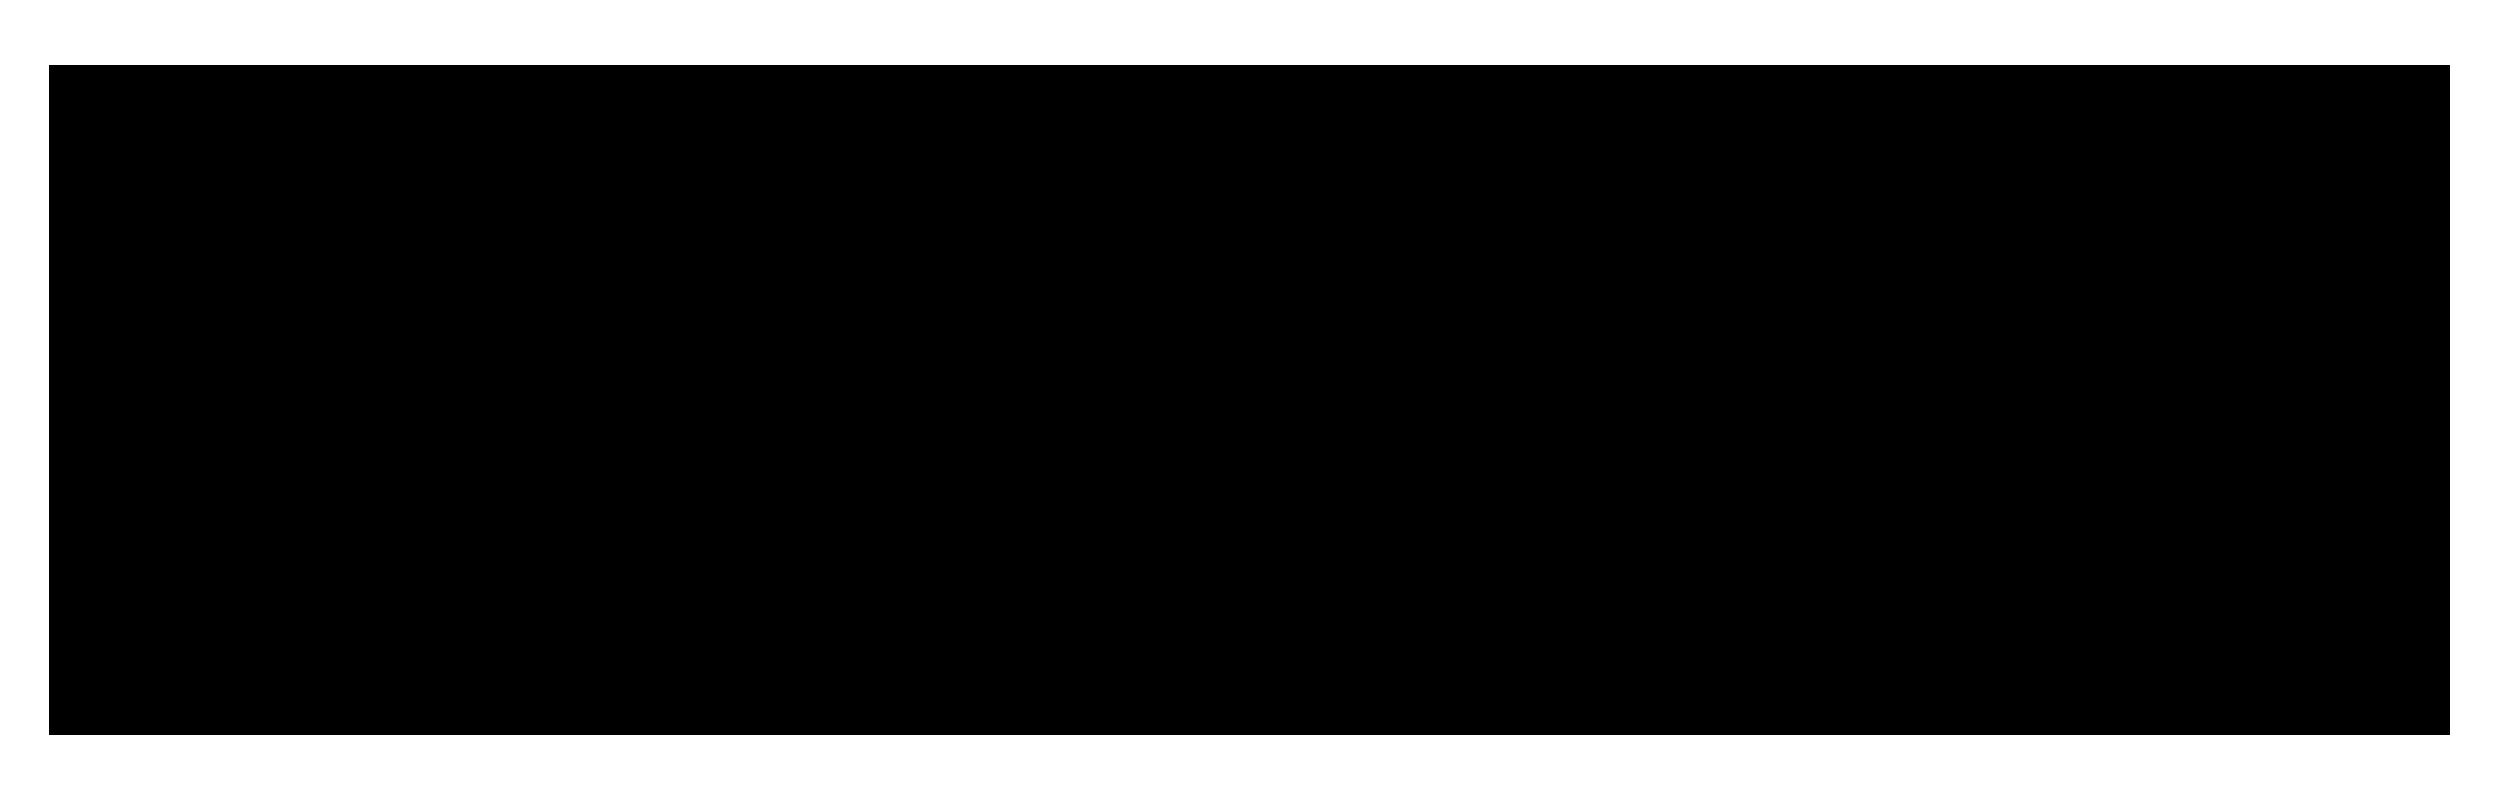 Juho Tirkkonen